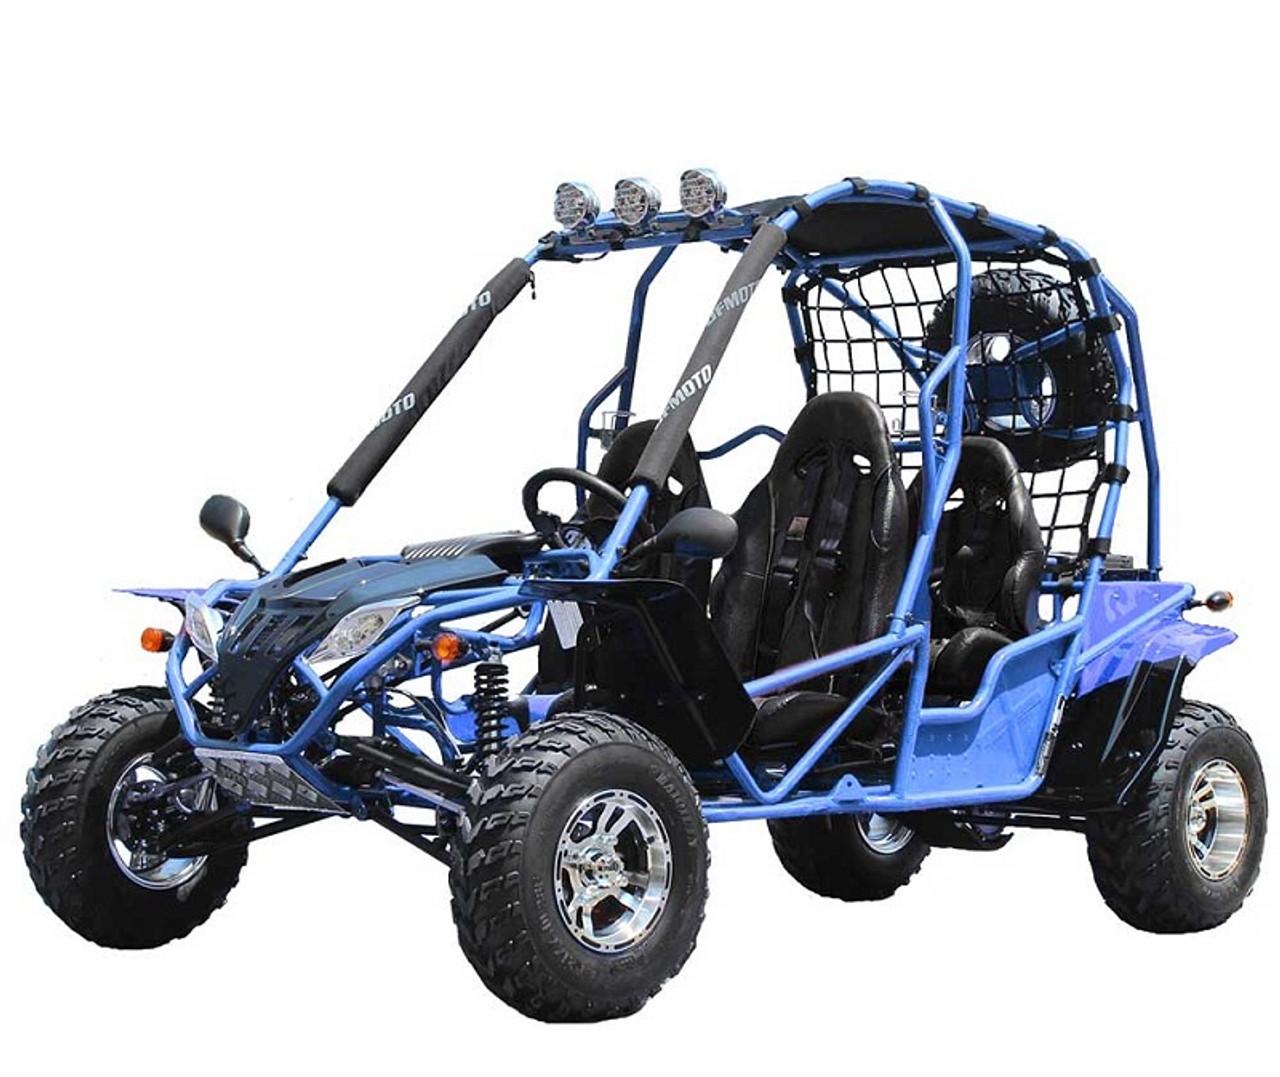 VITACCI 200 Jaguar 4 seater ( DF200GHA ) Go Kart Horizontal Type, 4-Stroke, Air-Cooled Single Cylinder